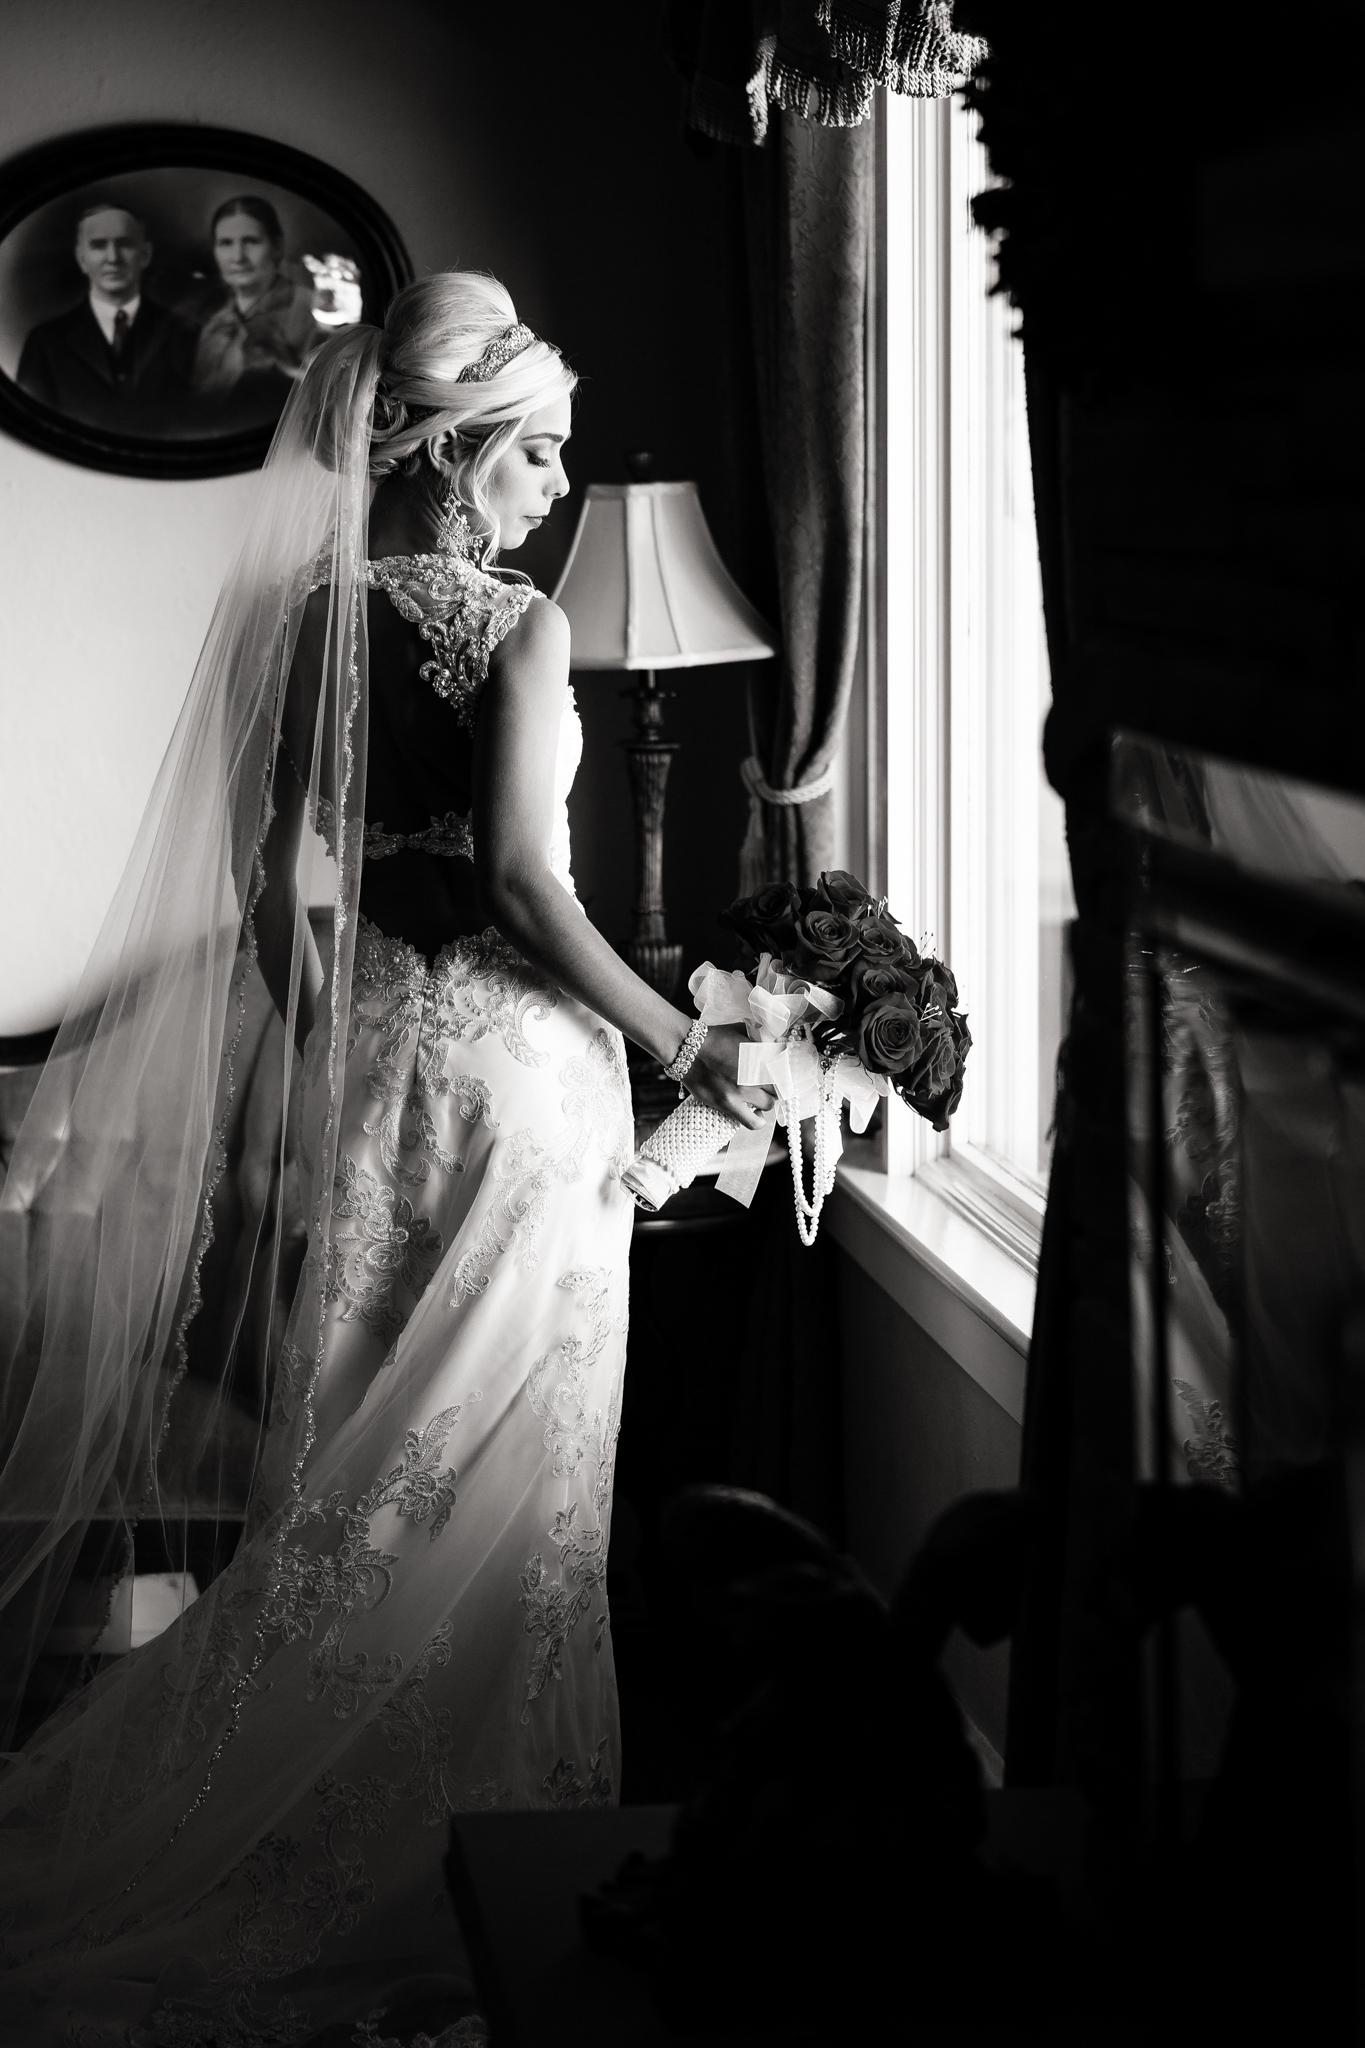 Statler-City-Buffalo-wedding-photographer- 0102bw.jpg